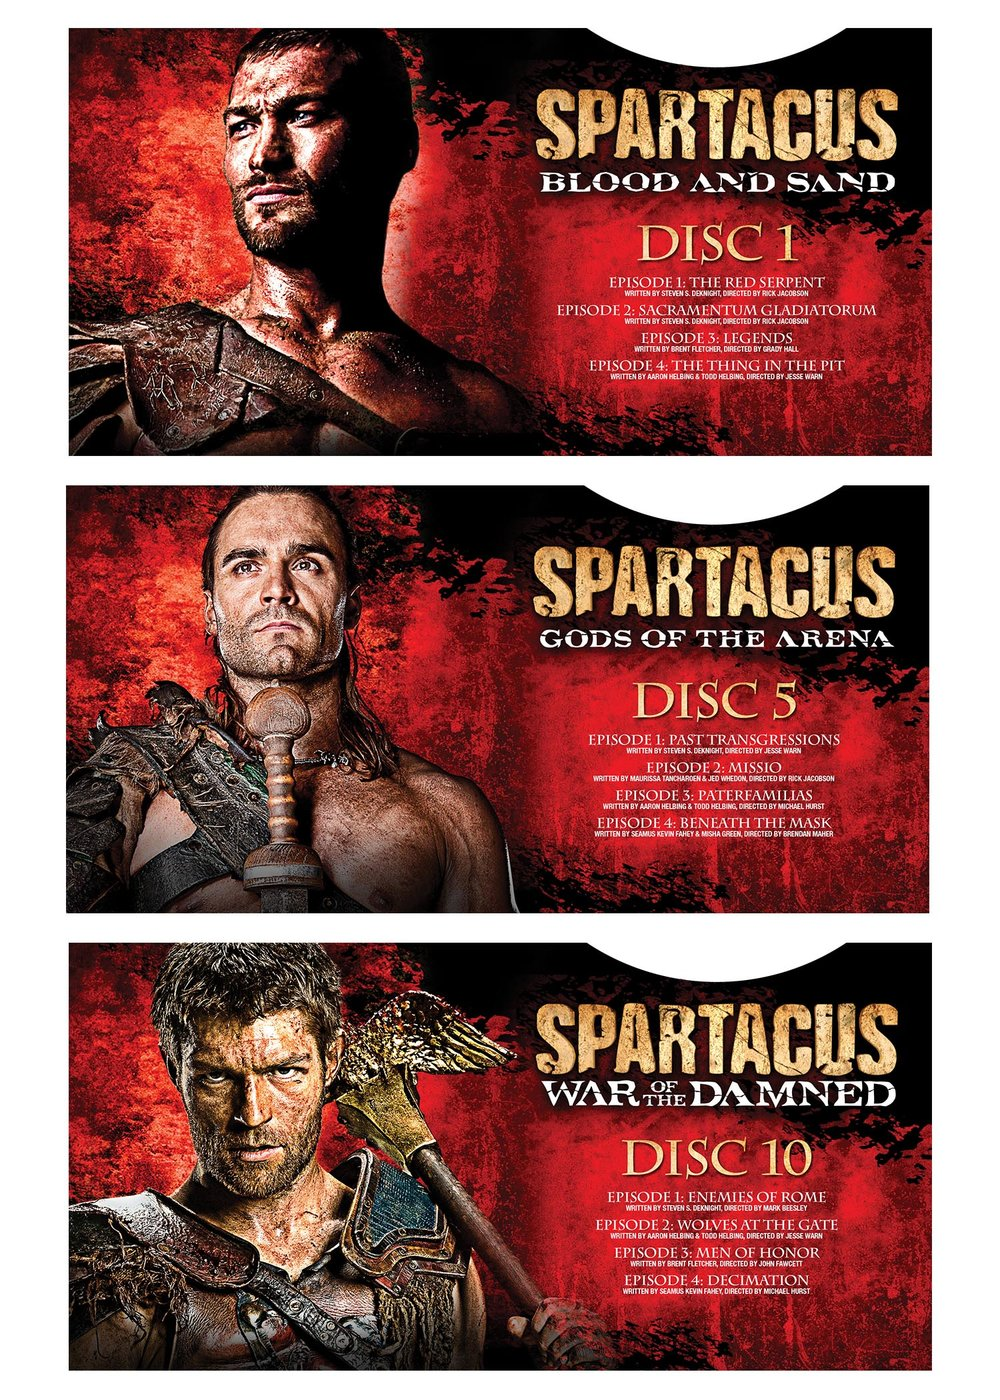 spartacus collection.jpg